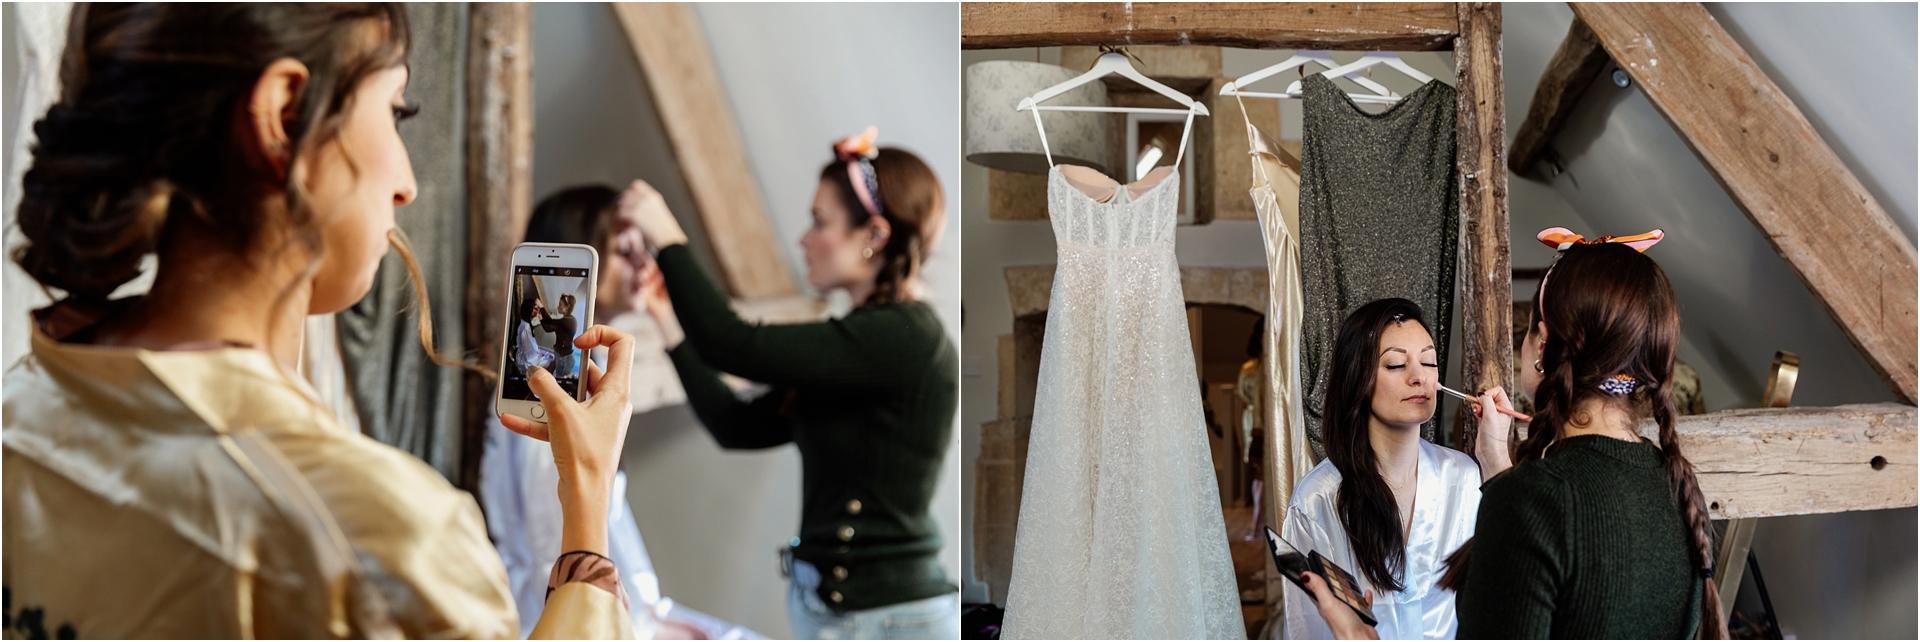 Bridal prep at Lapstone Barn